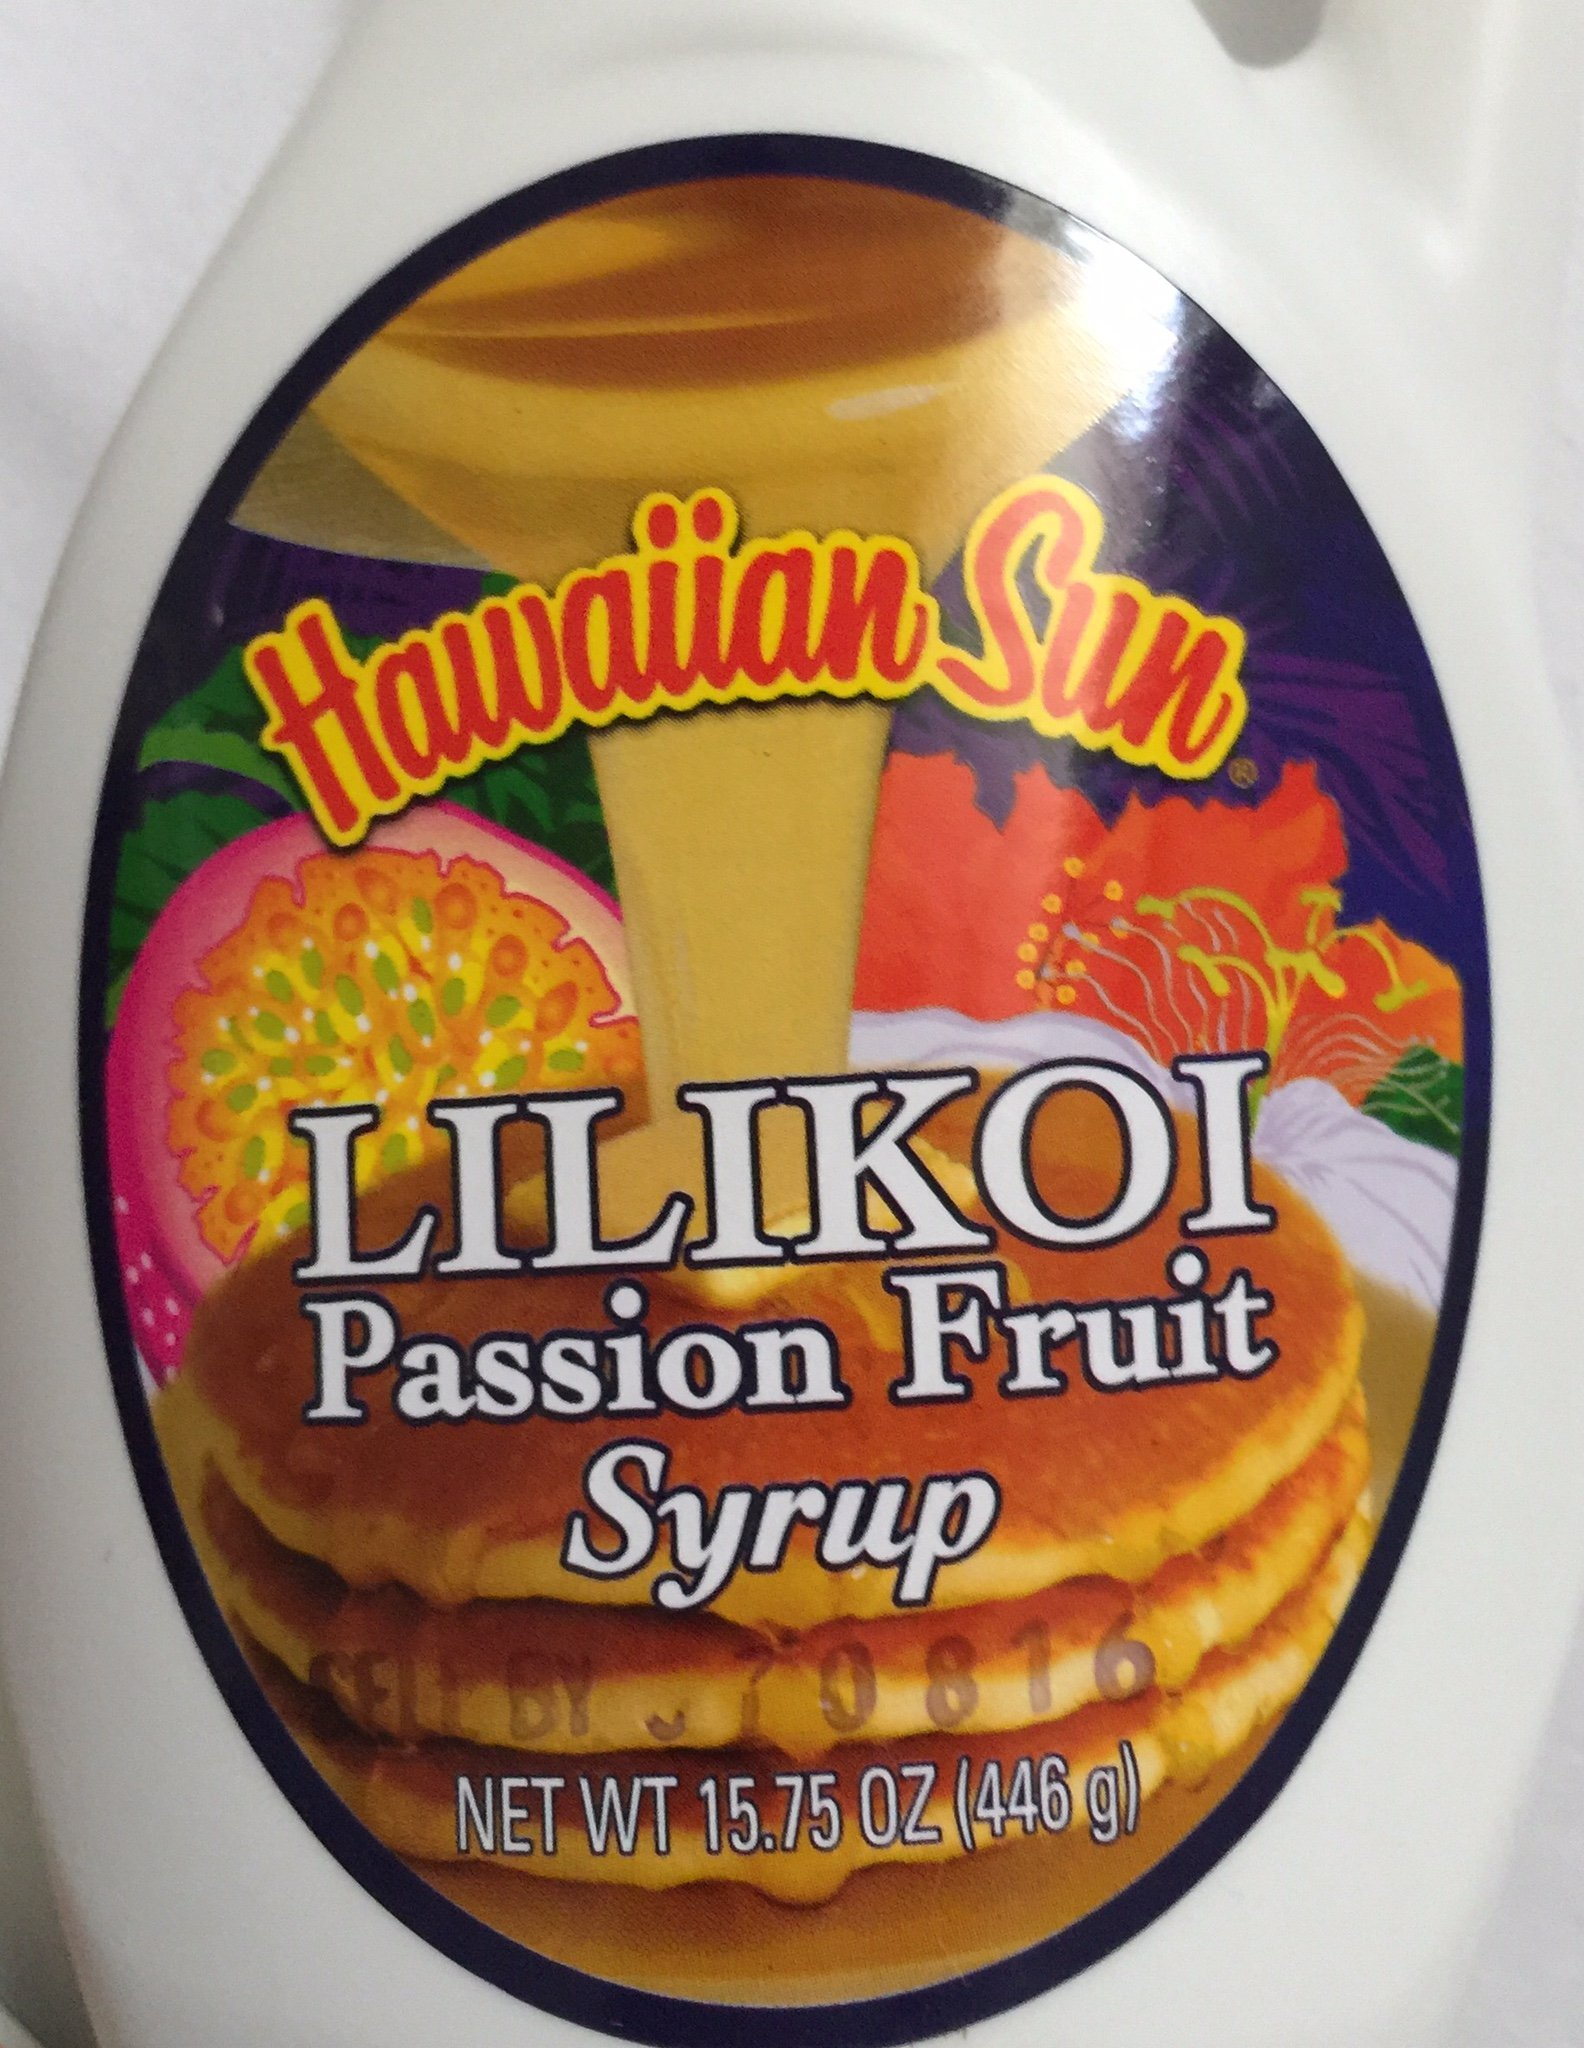 Hawaiian Sun Tropical Pancake Lovers Bundle Set - 3 Strawberry Guava, 3 Banana Macadamia, 3 Chocolate Macadamia, 3 Pineapple Coconut 12 Pancake Mixes Total Plus Coconut, Lilikoi and Guava Syrups. by Hawaiian Sun (Image #2)